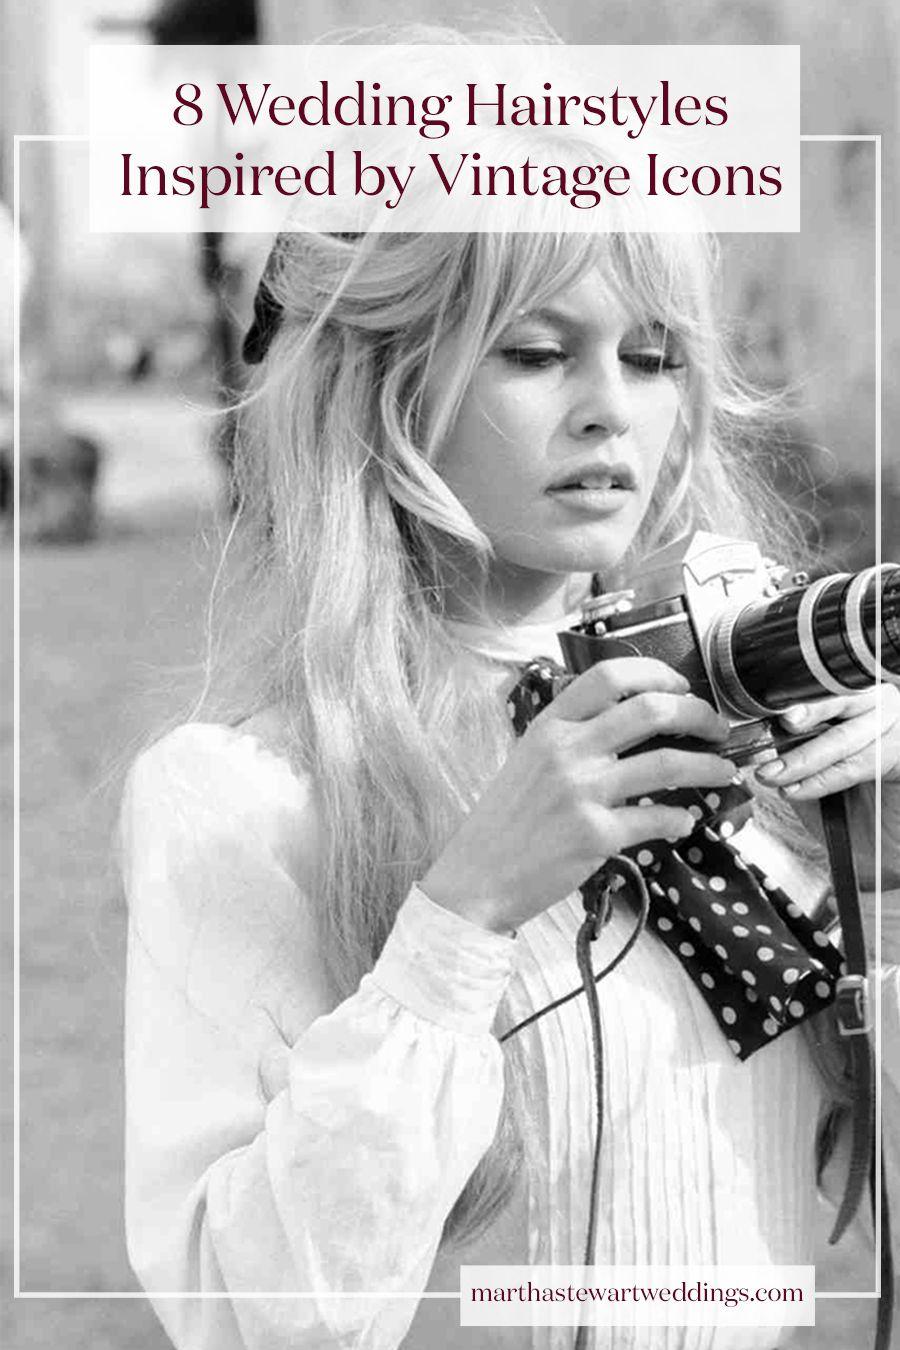 8 Wedding Hairstyles Inspired by Vintage Icons | Martha Stewart ...